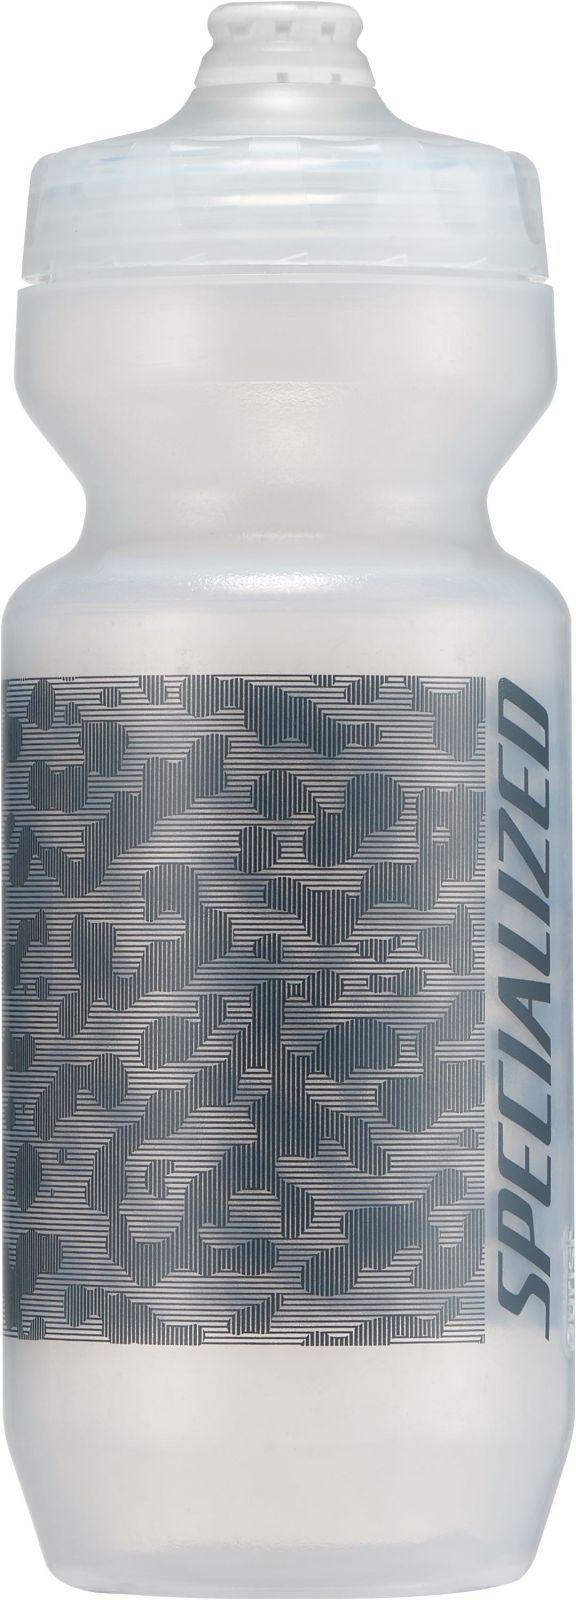 Specialized Purist Fixy 22 oz - translucent/grey terrain camo uni